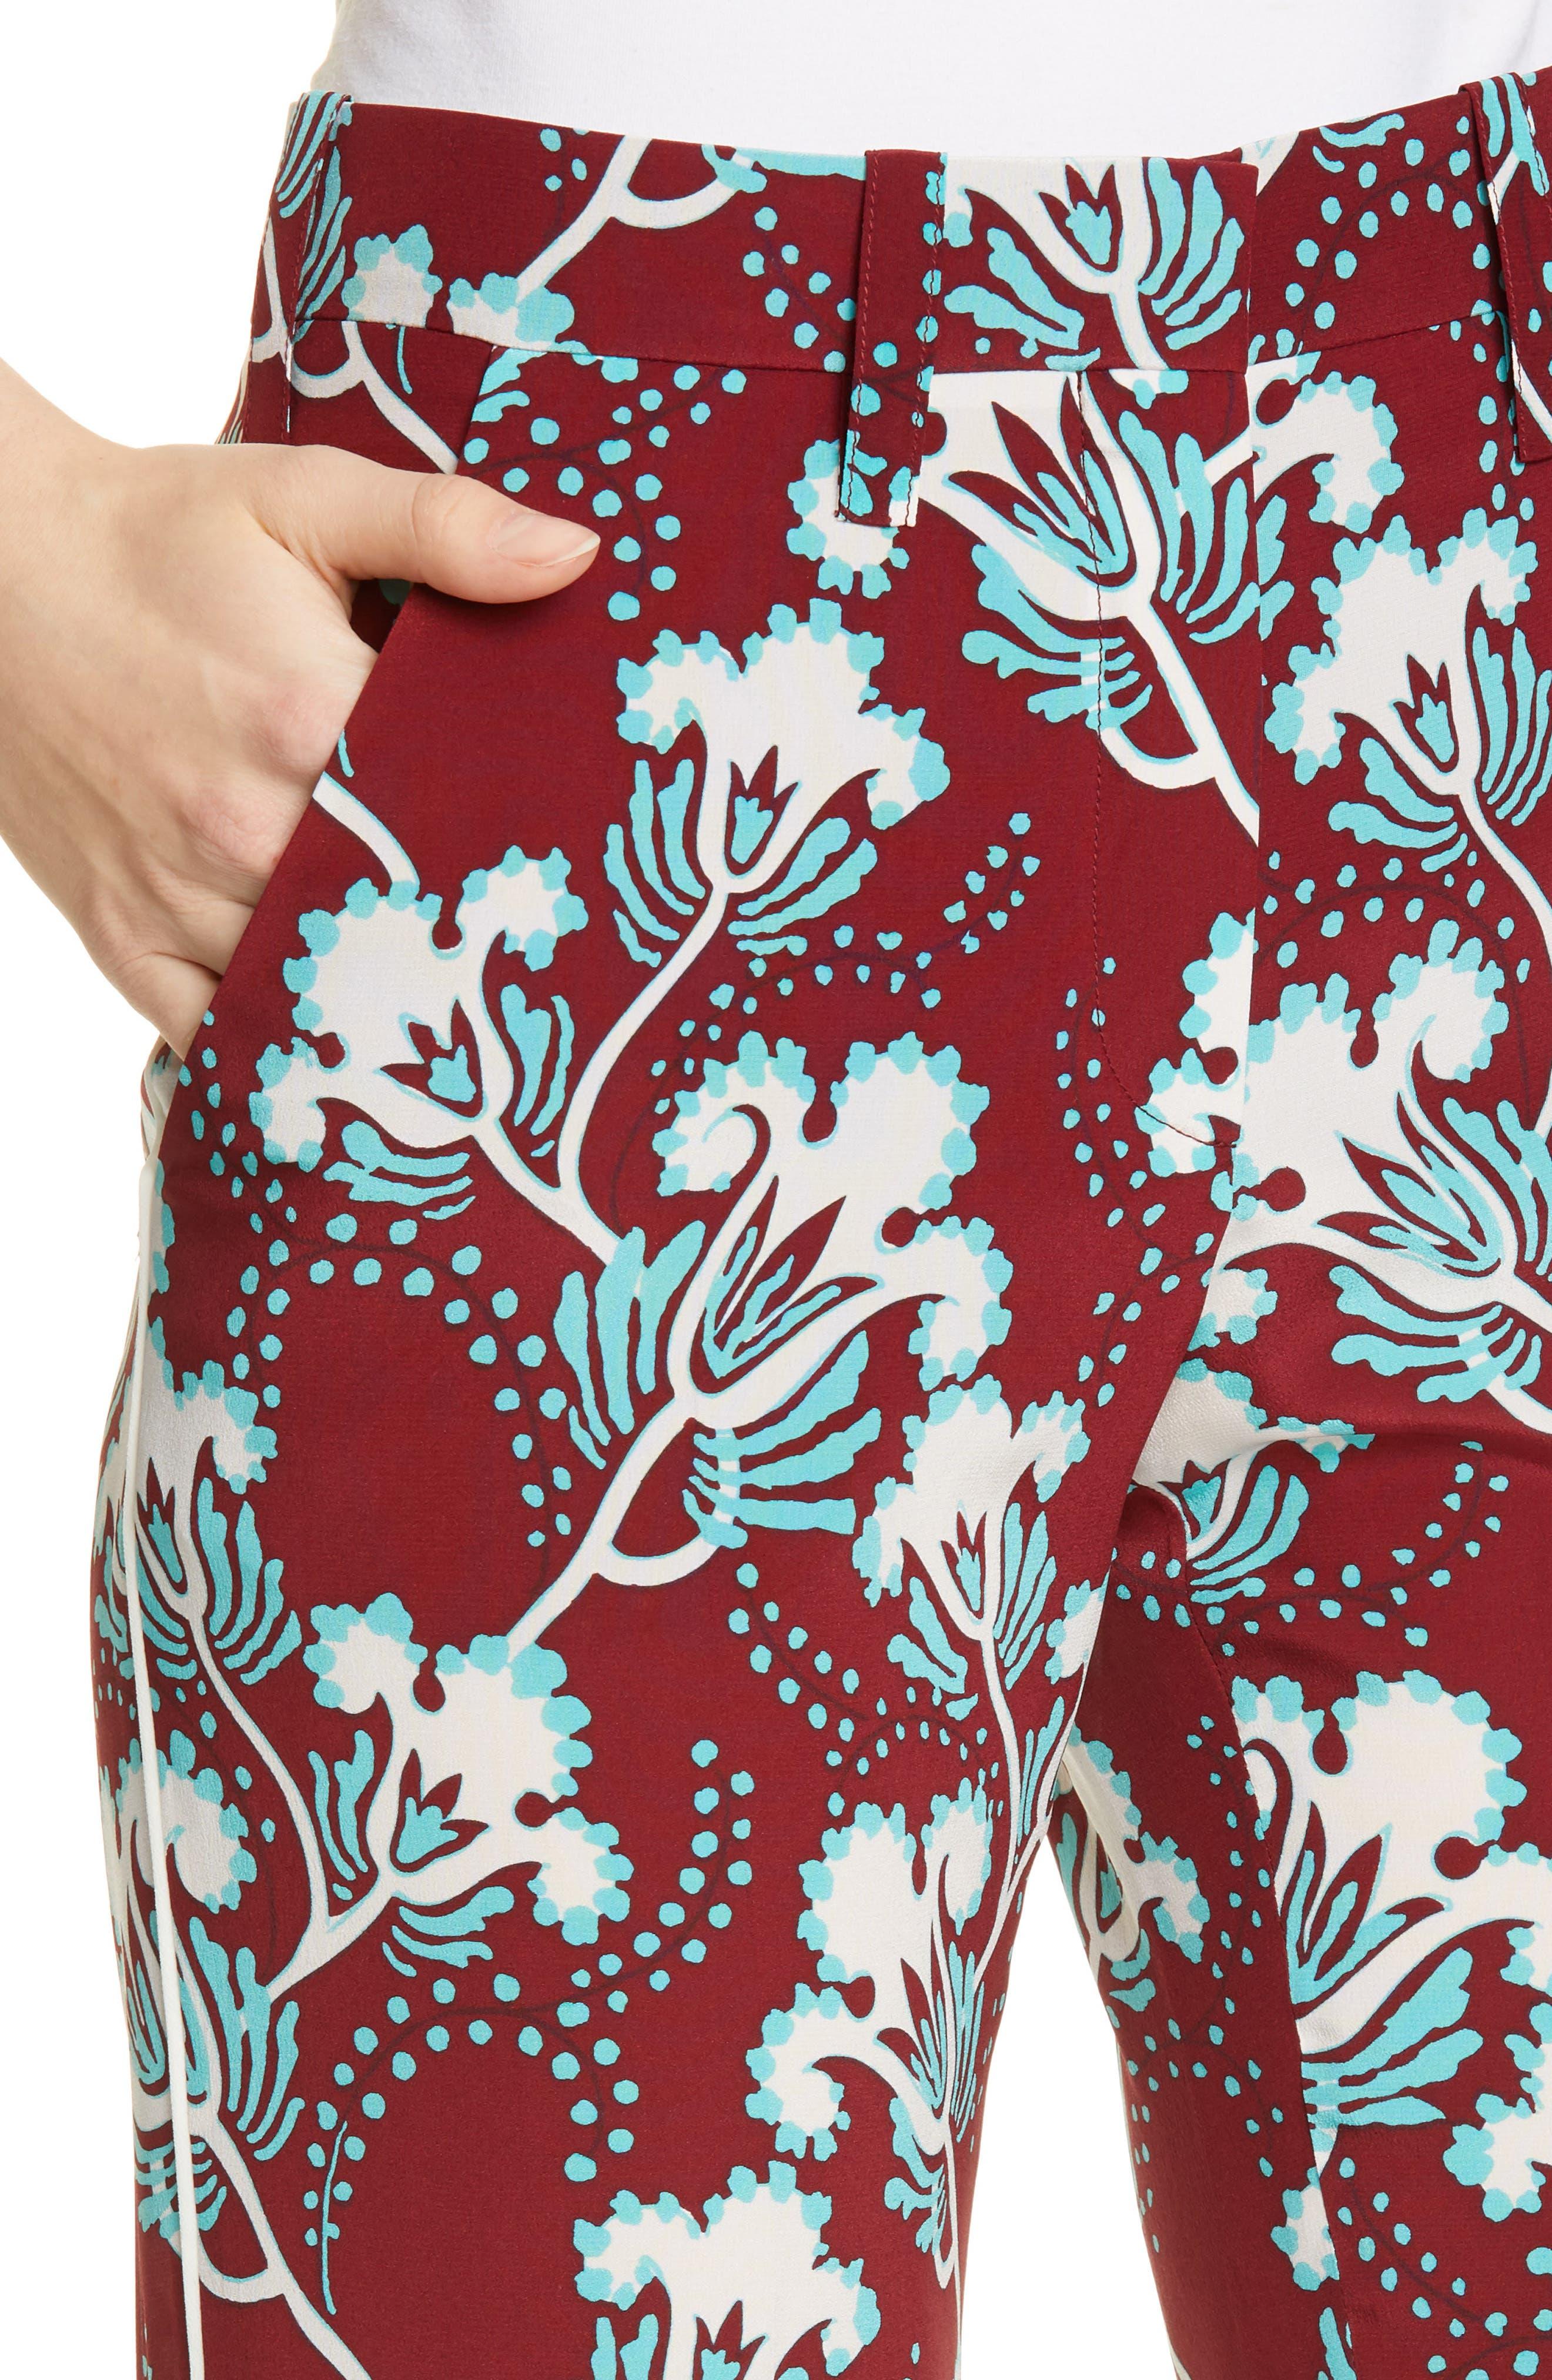 VALENTINO, Elderflower Print Wide Leg Silk Pants, Alternate thumbnail 4, color, GTB-GARNET/TURCHESE/BIANCO